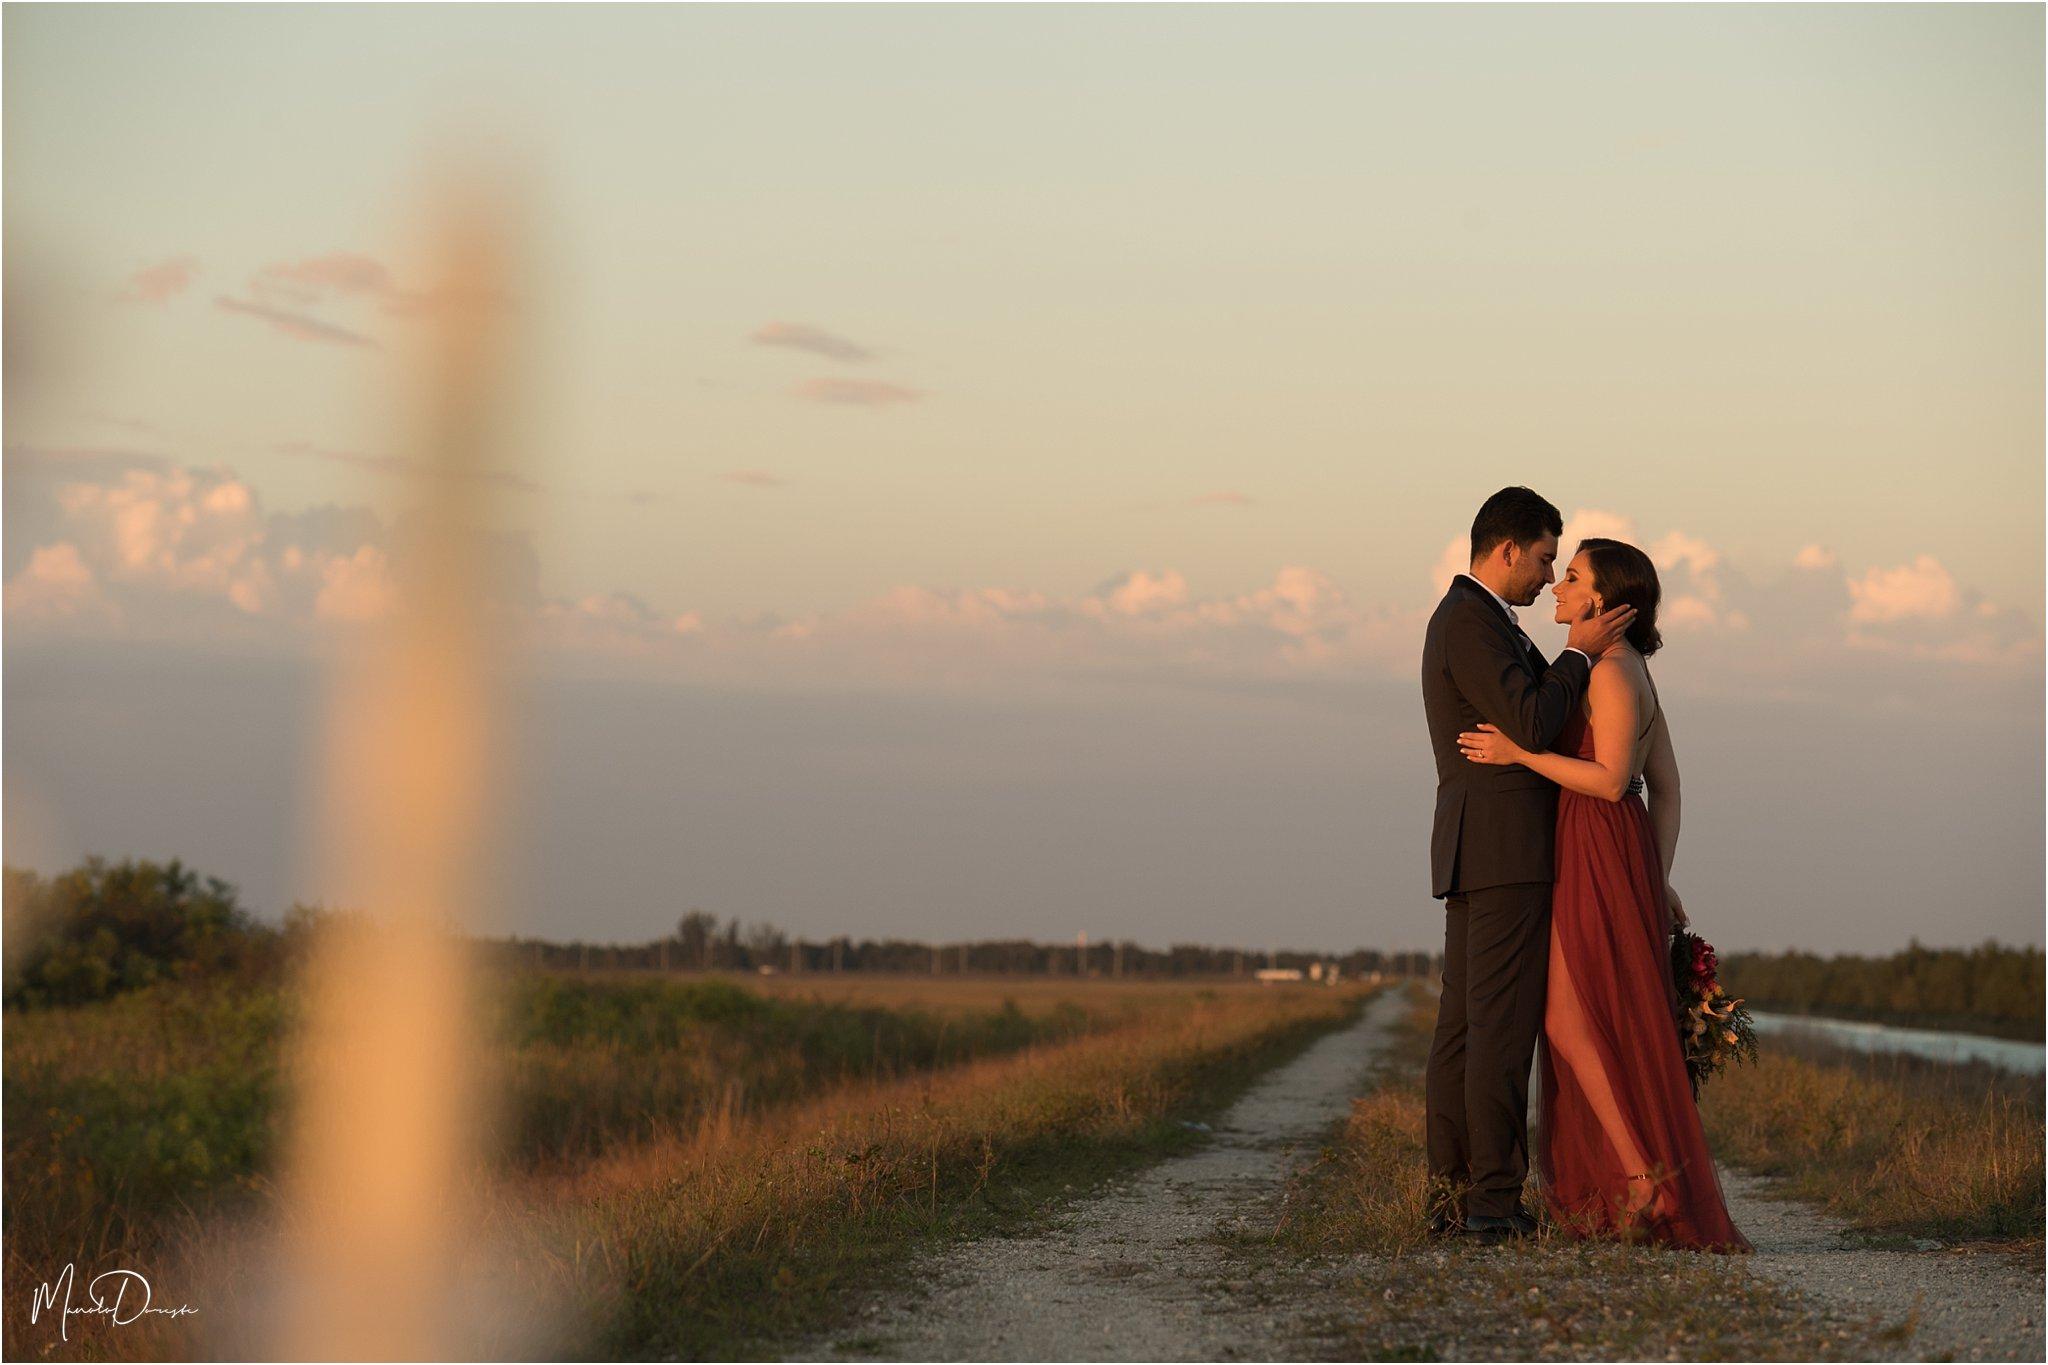 00824_ManoloDoreste_InFocusStudios_Wedding_Family_Photography_Miami_MiamiPhotographer.jpg